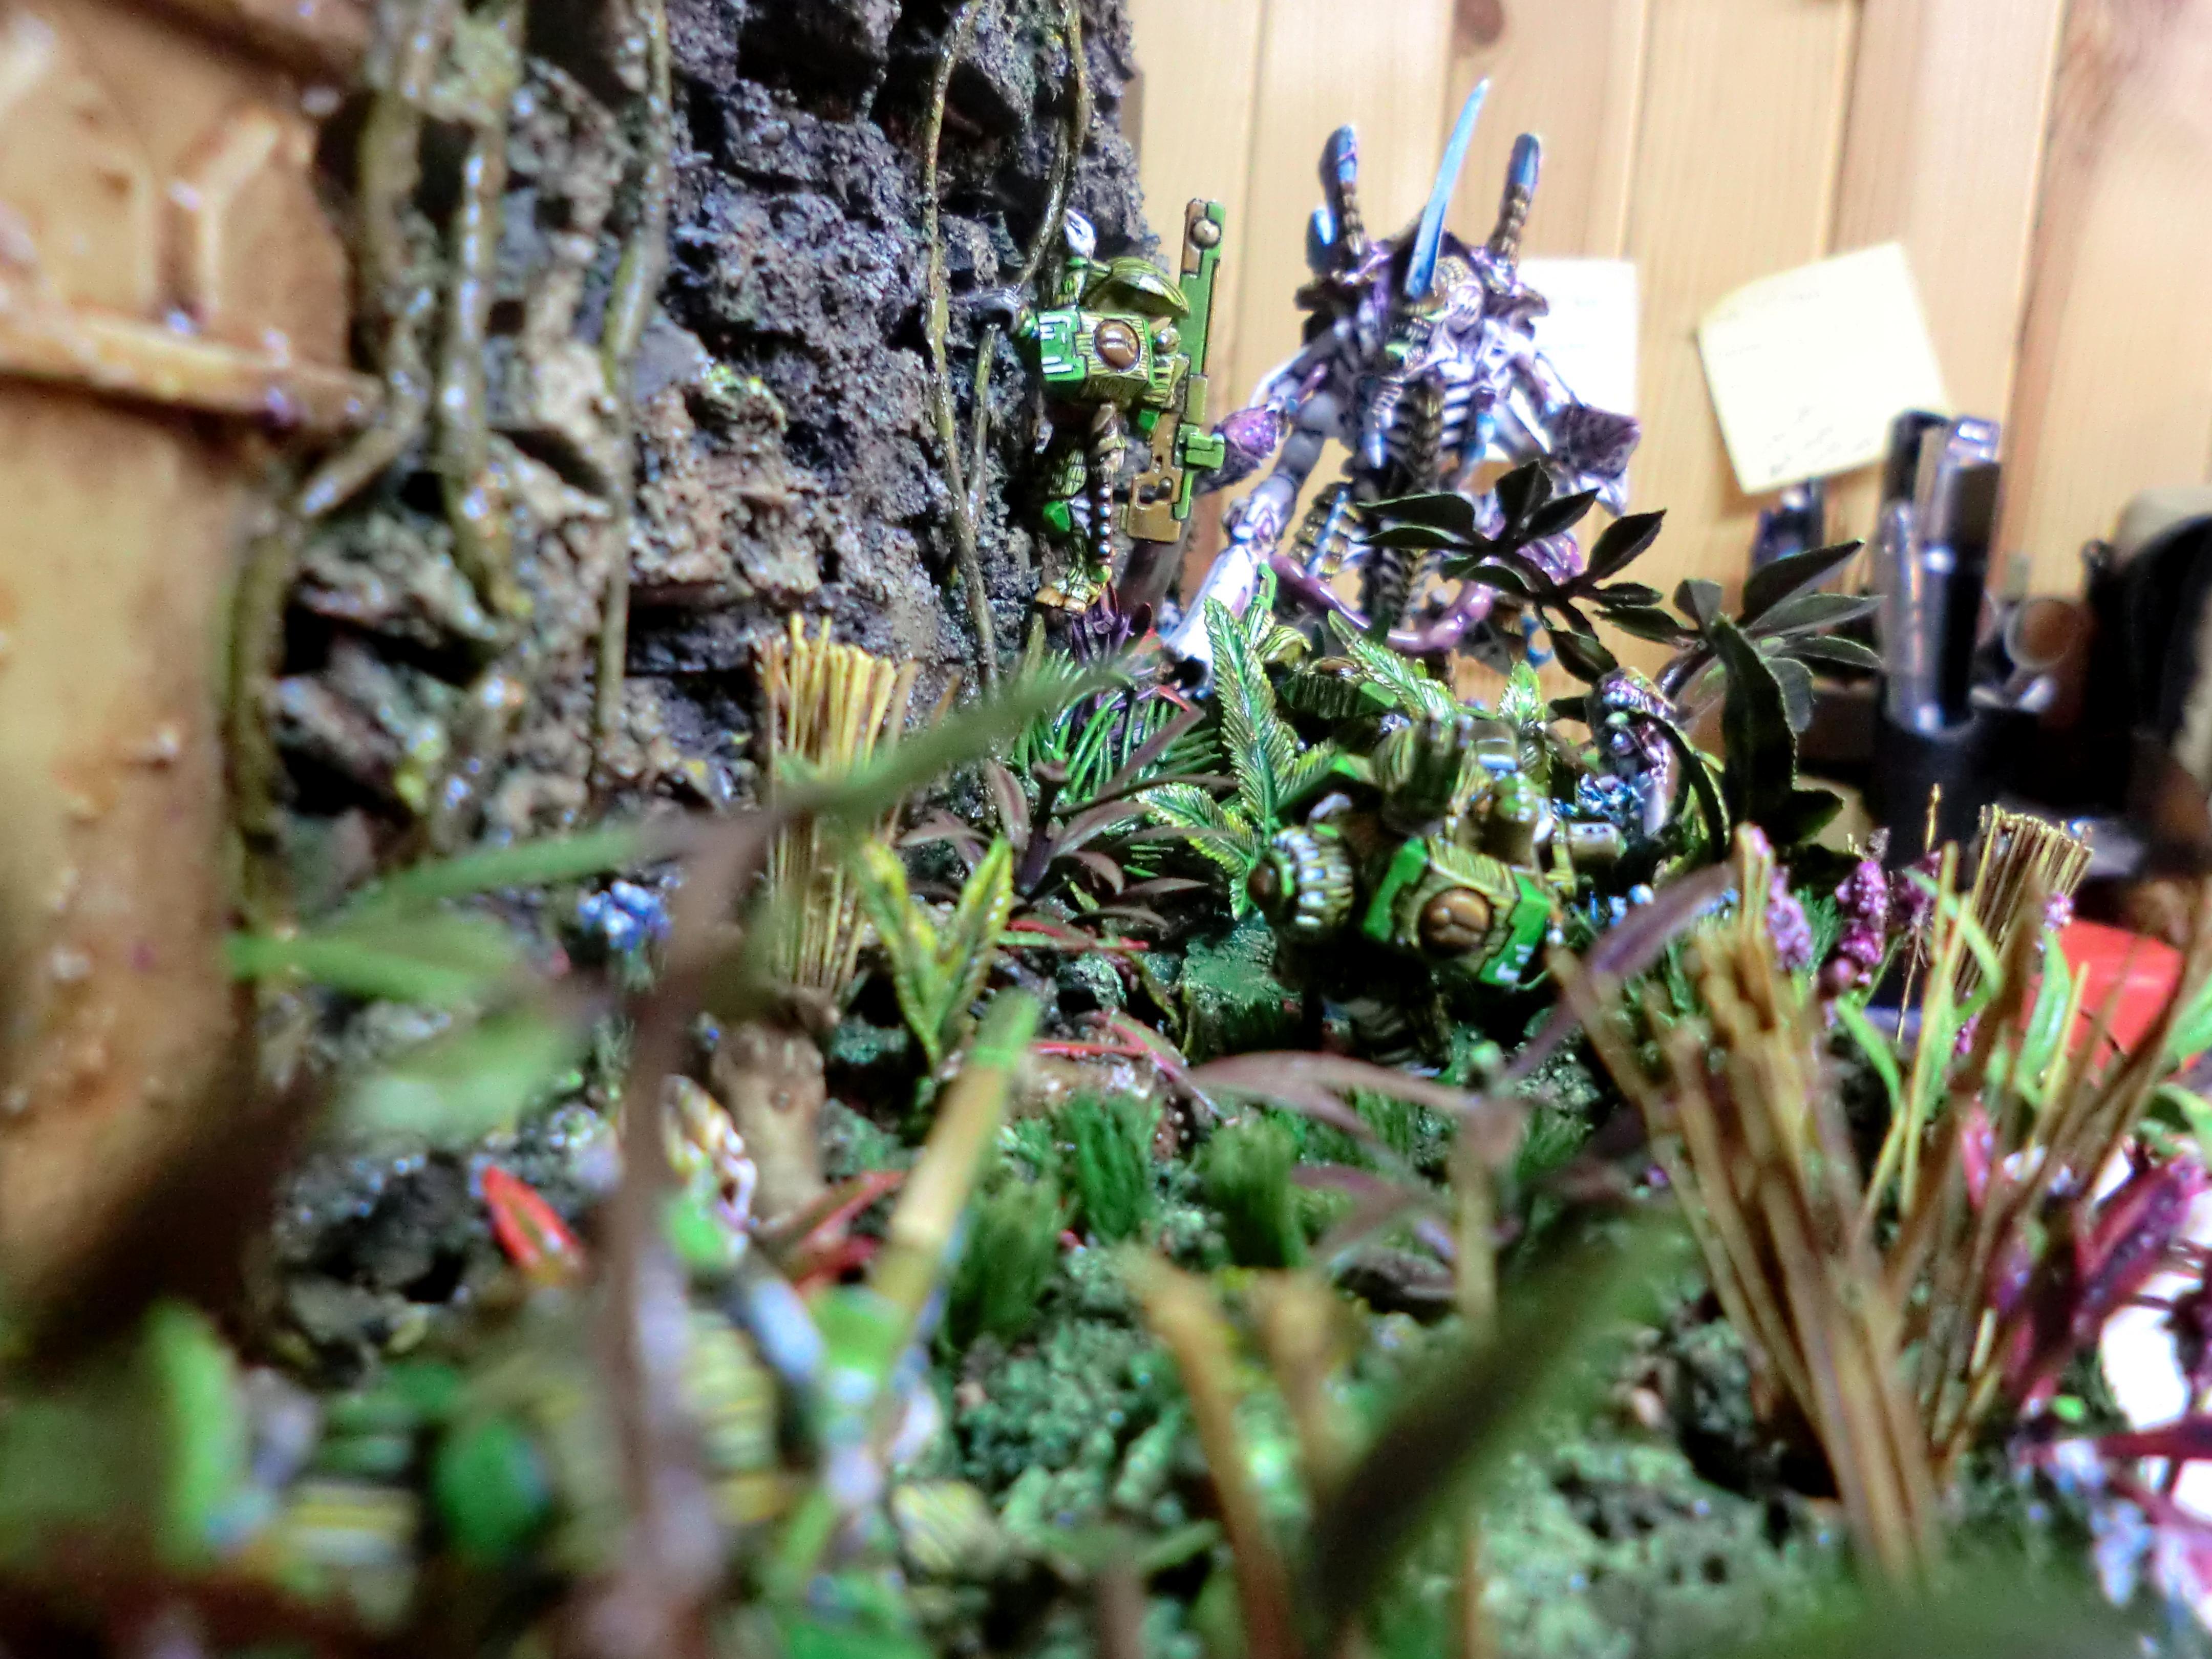 Diorama, Golden Demon, Jungle, Tau, Tyranids, Wall, Warhammer 40,000